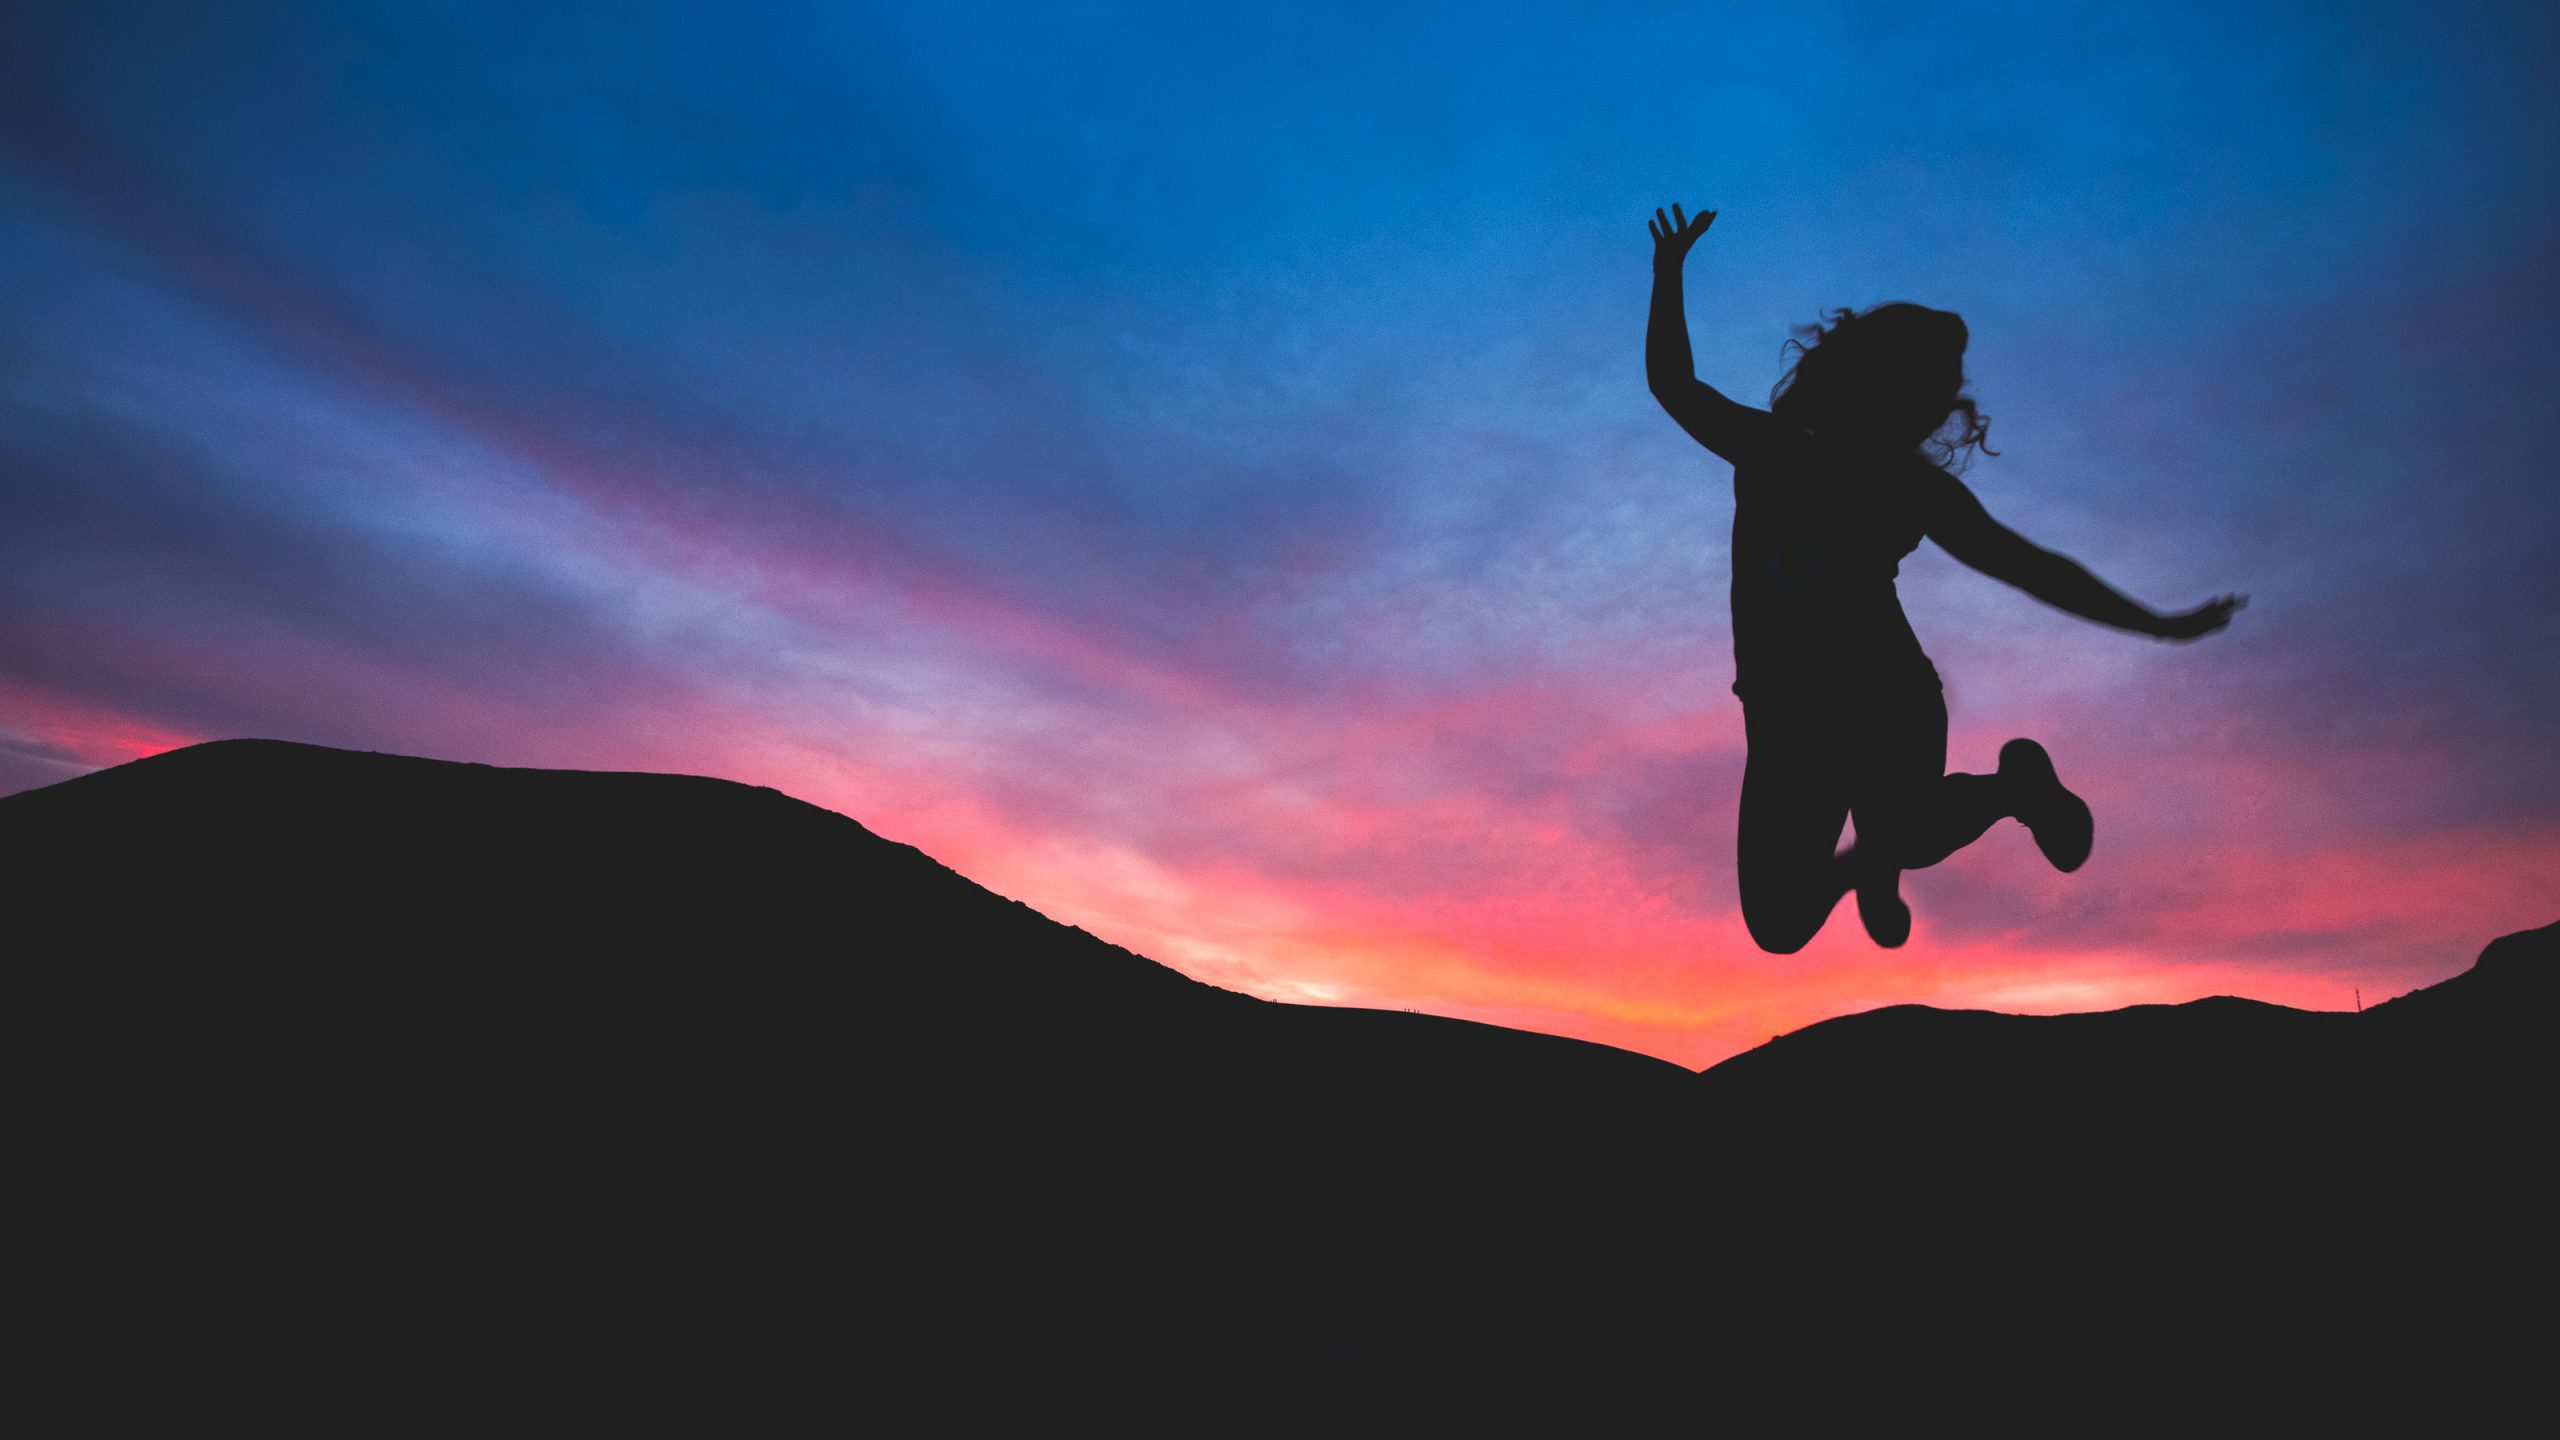 sunset silhouette jumping for joy